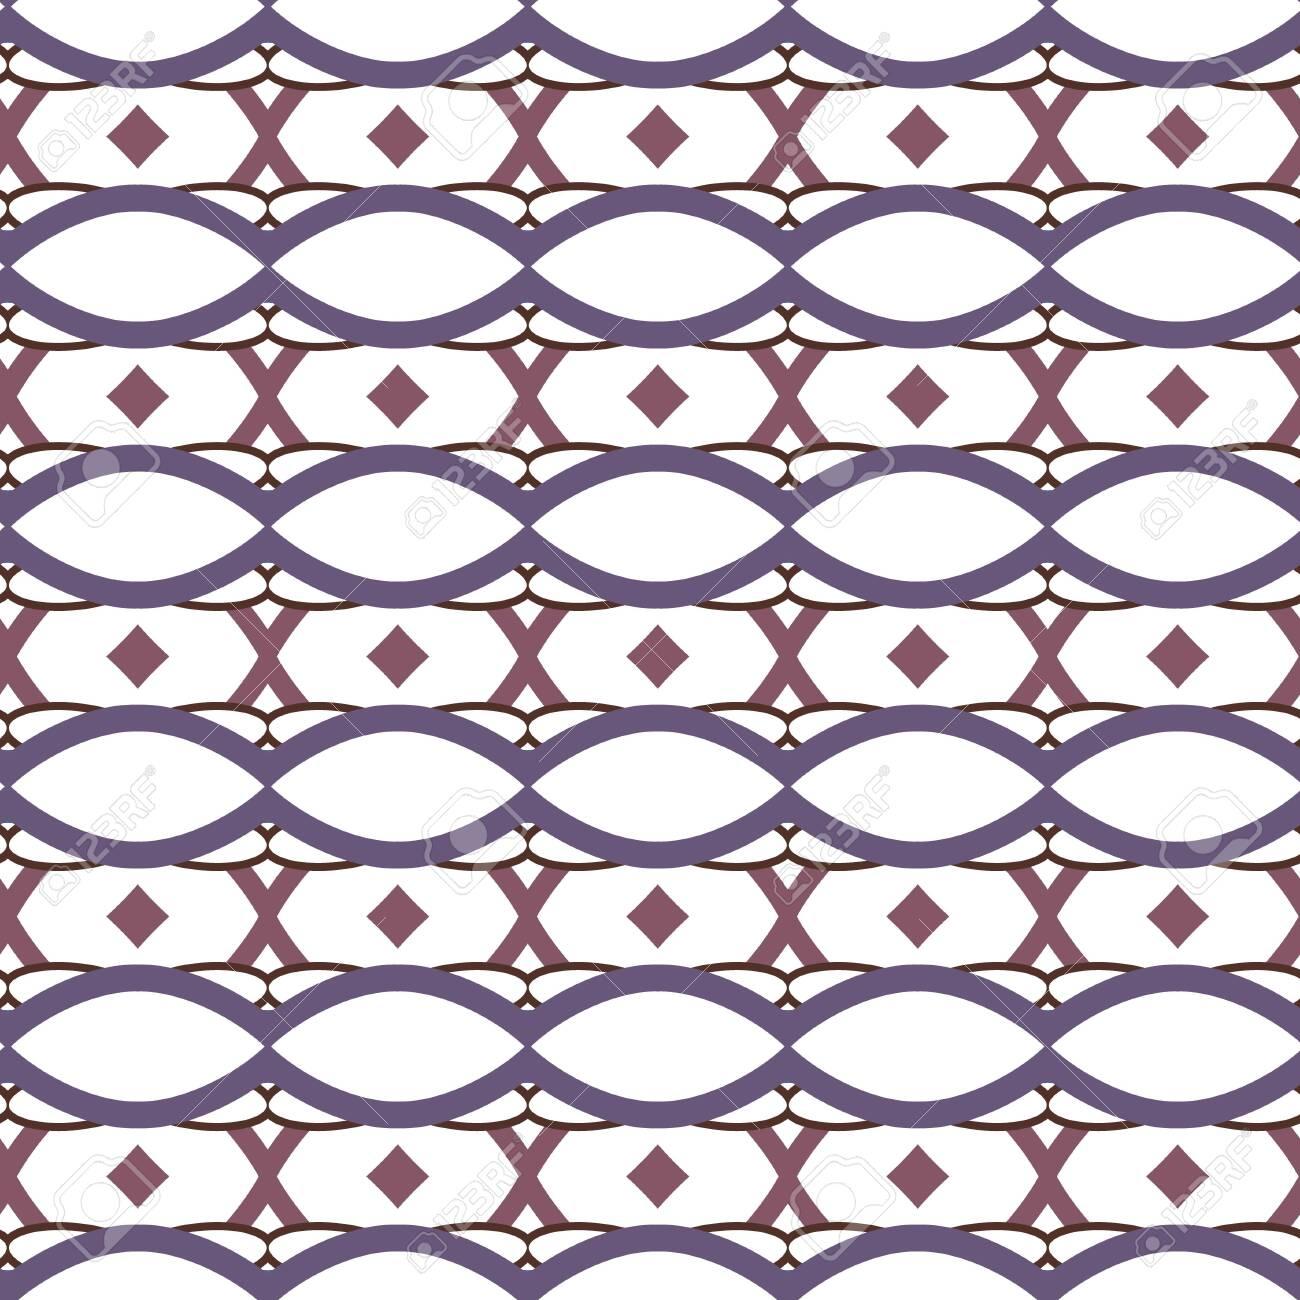 Seamless vector pattern in geometric ornamental style - 130309989